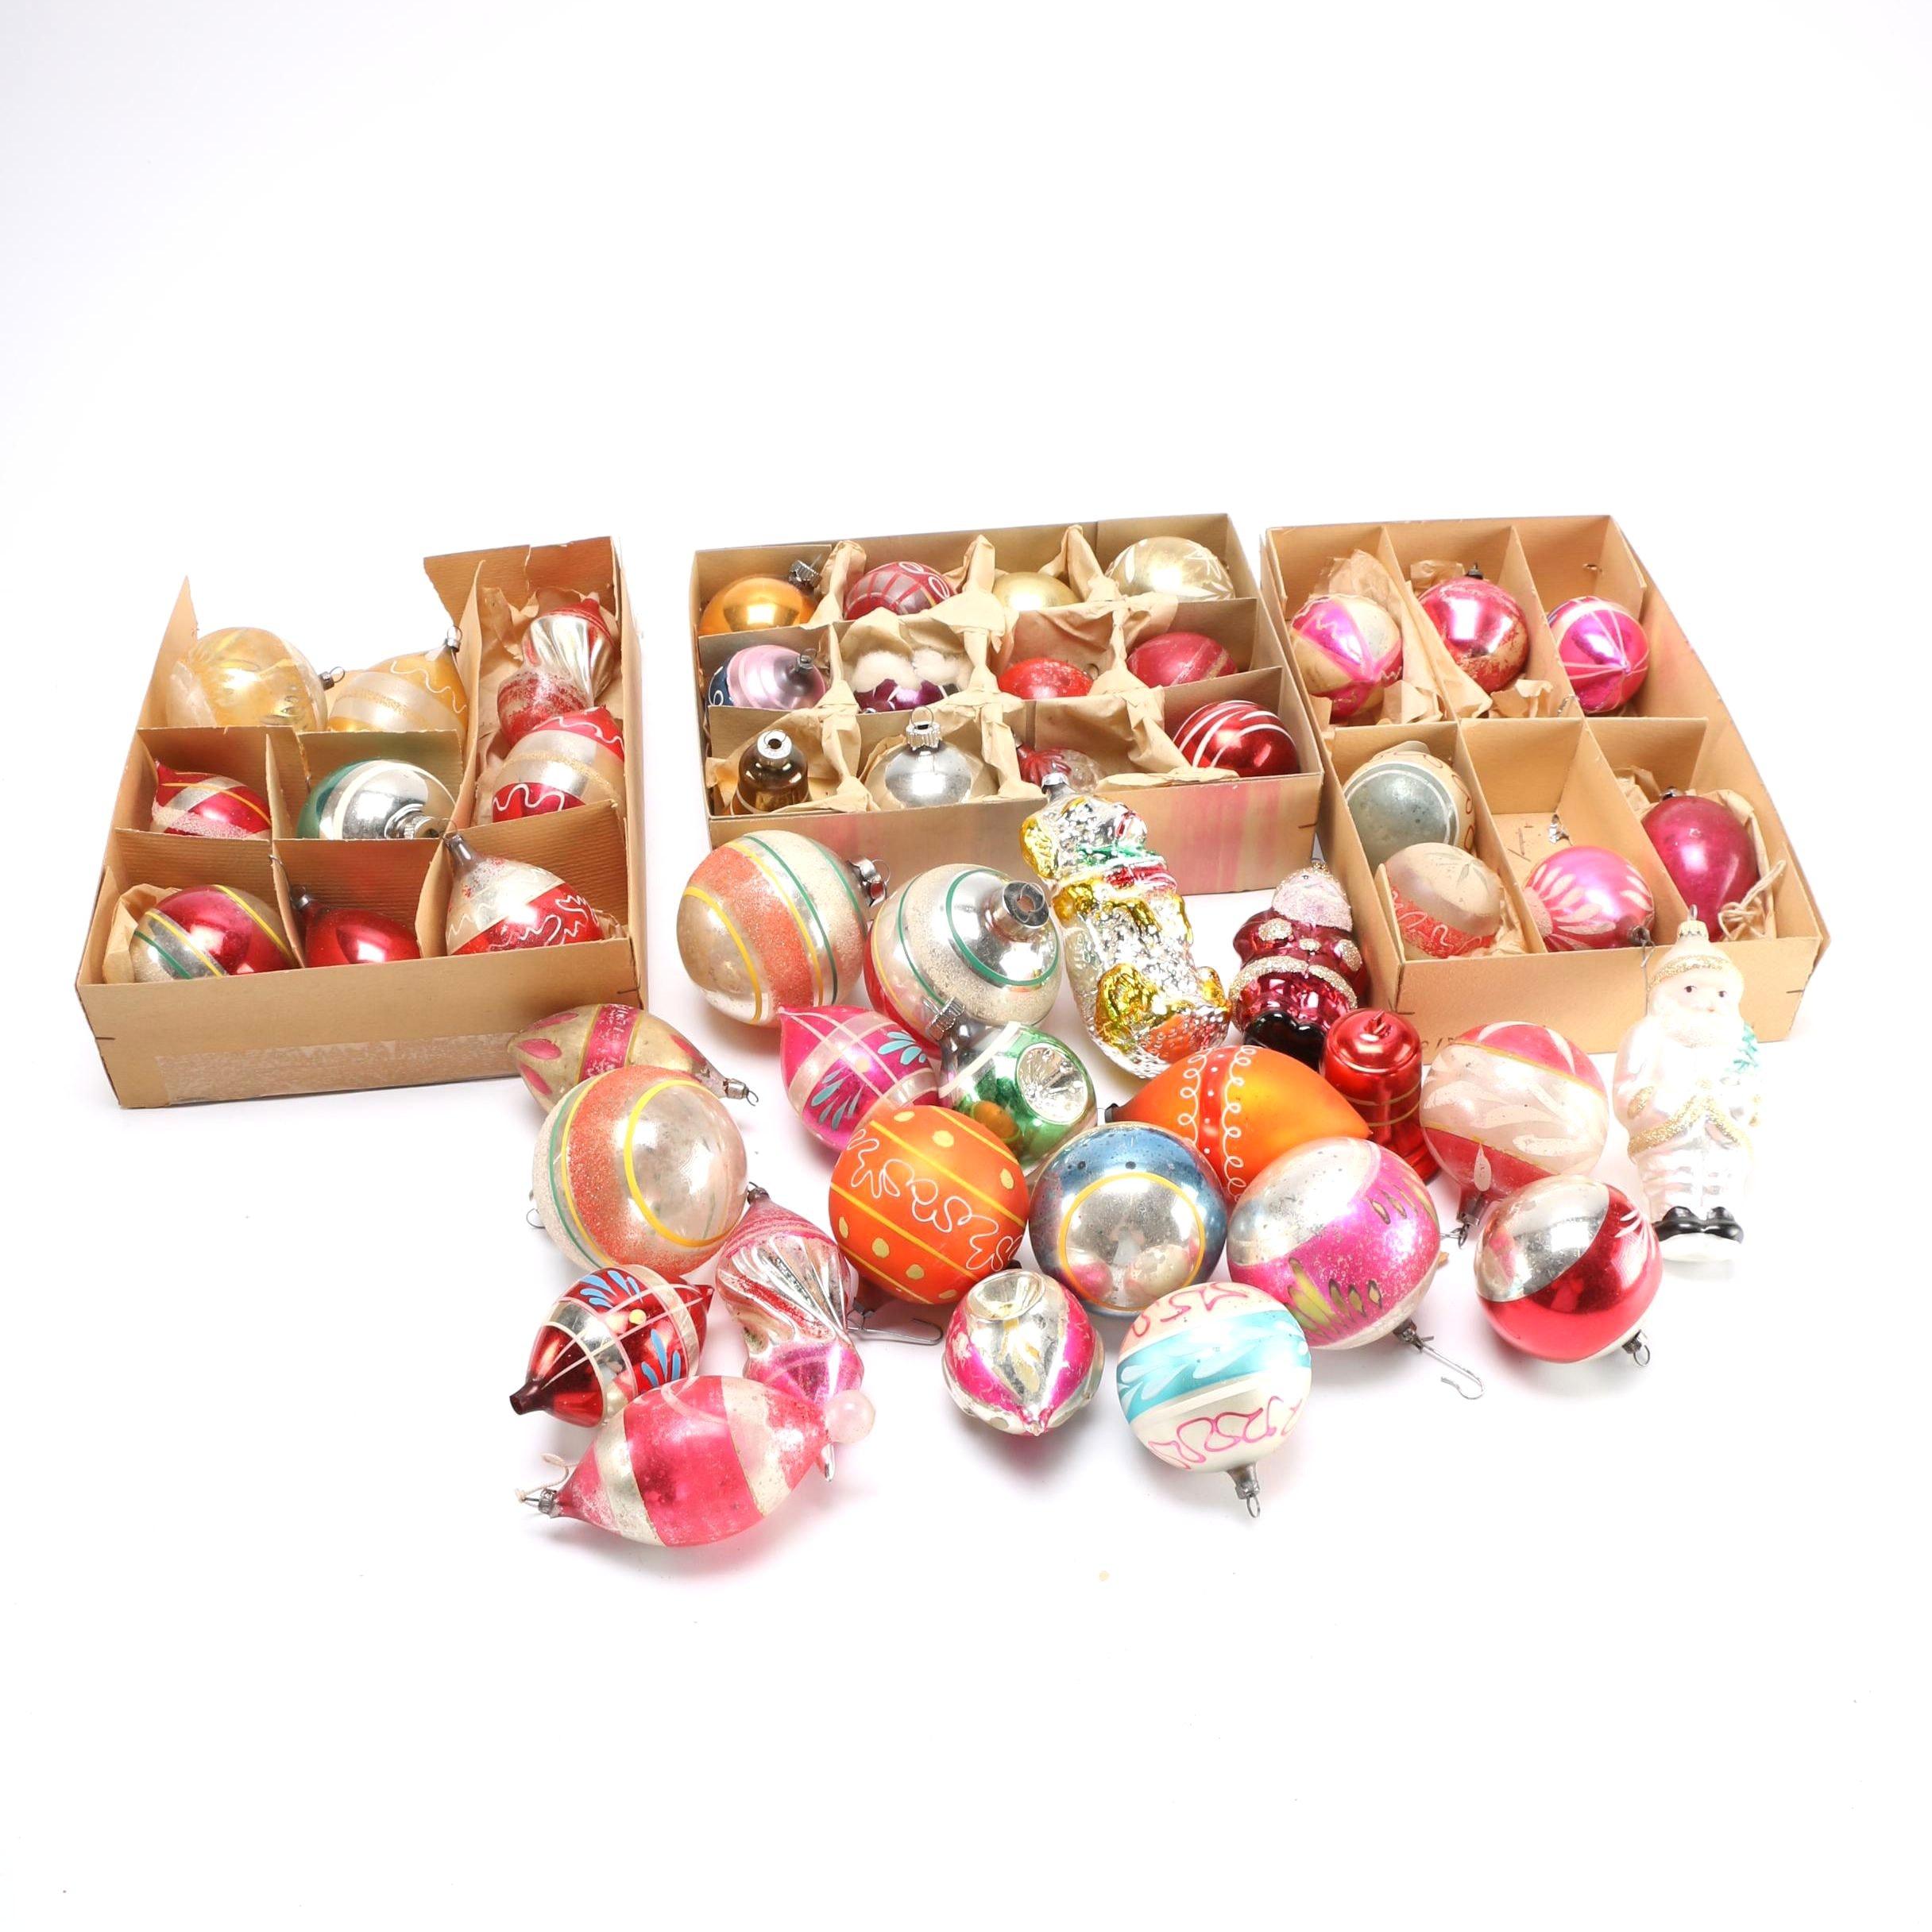 Vintage Glass and Plastic Christmas Tree Ornaments